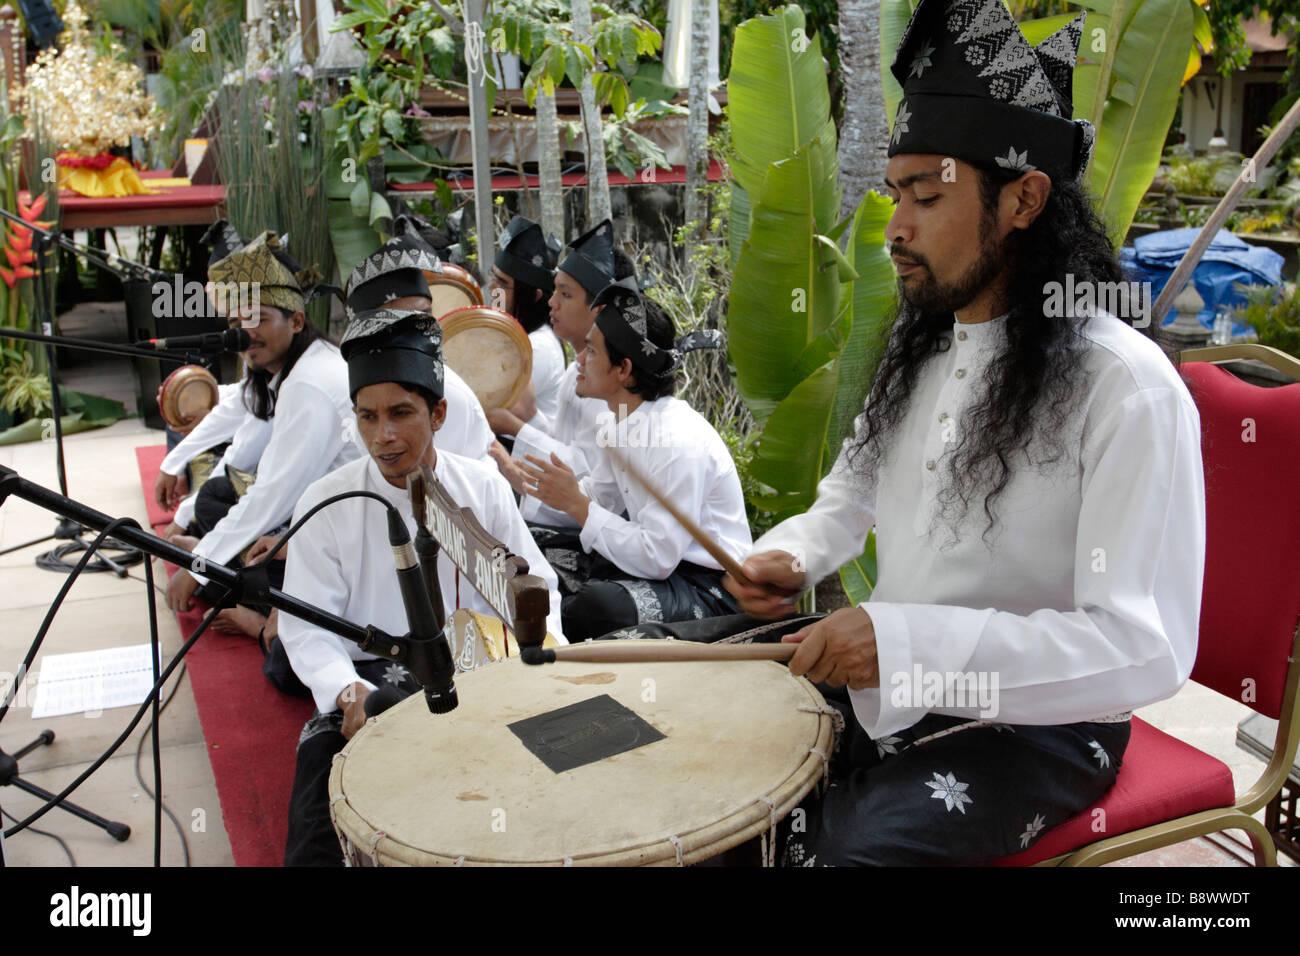 Playing Traditional Music During A Wedding At Aryani Resort In Terengganu Malaysia